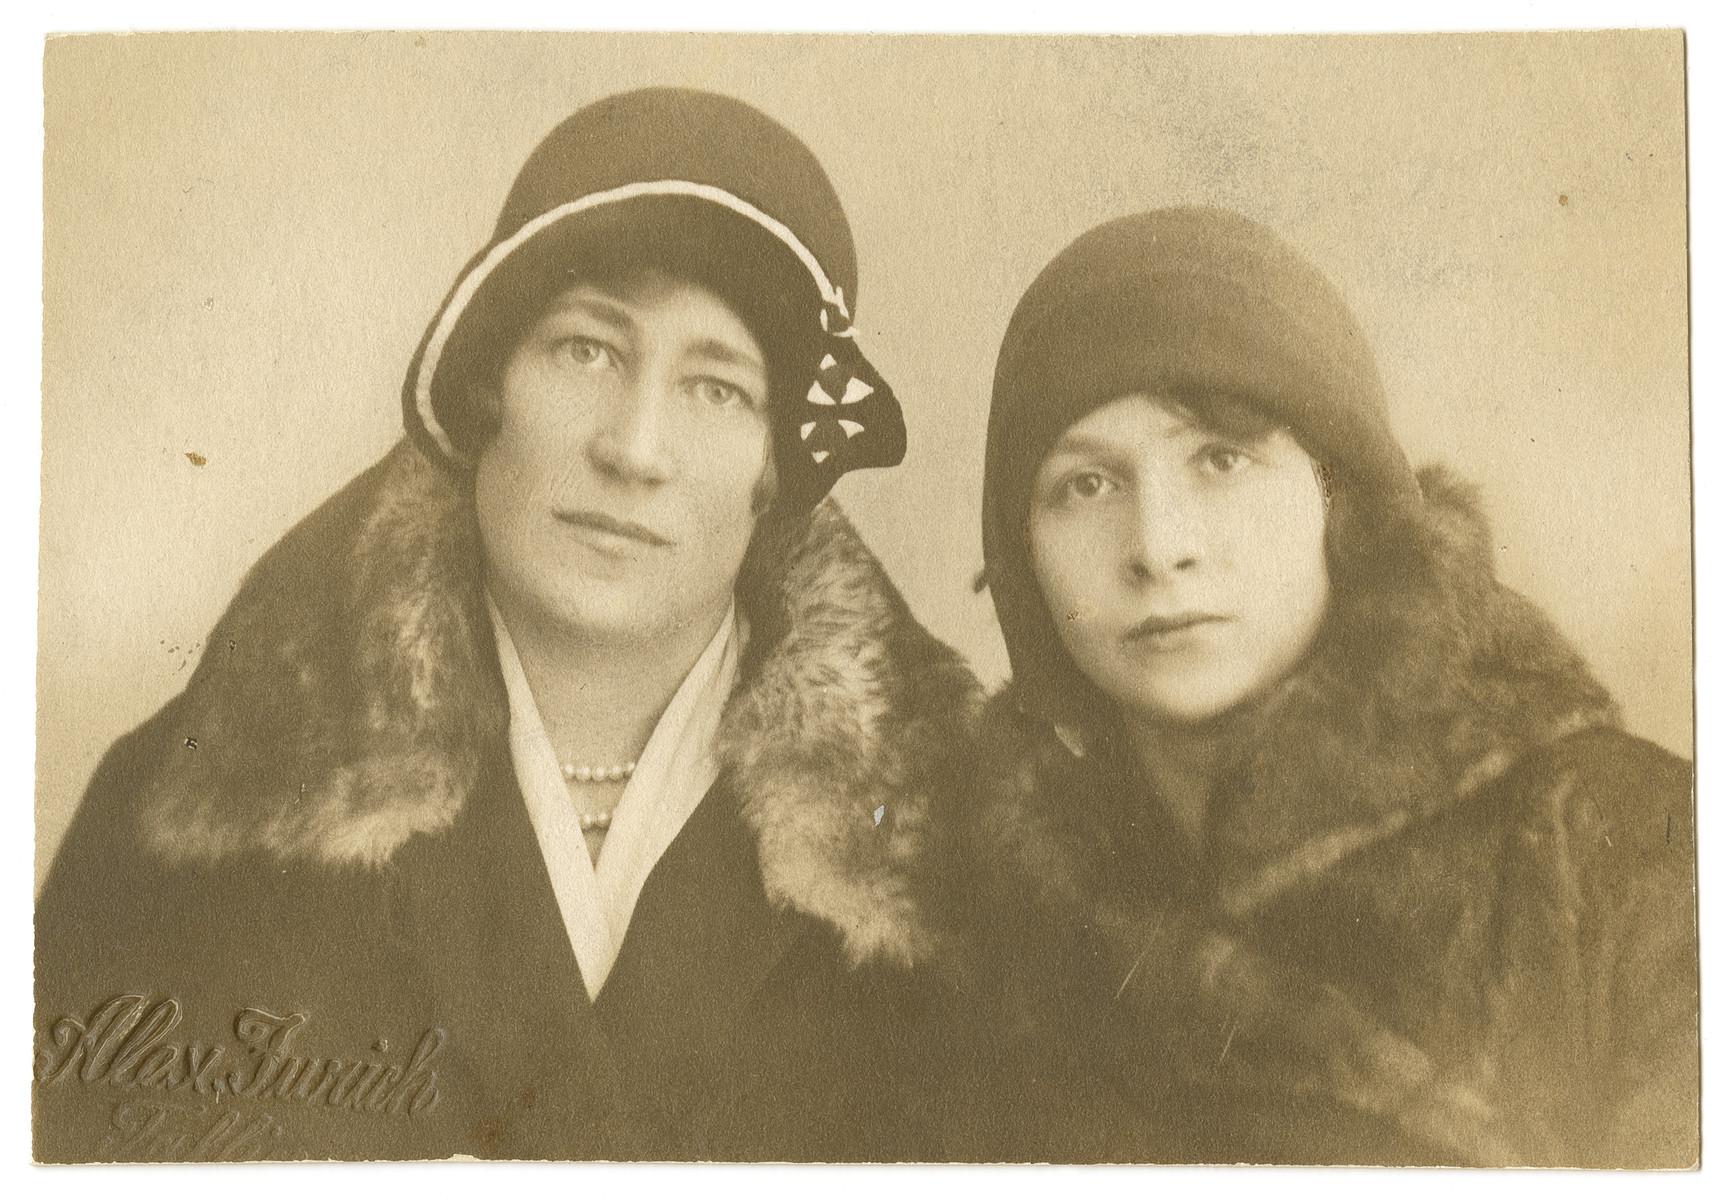 Portrait of Deborah-Miriam Dobrysh and an unknown person.